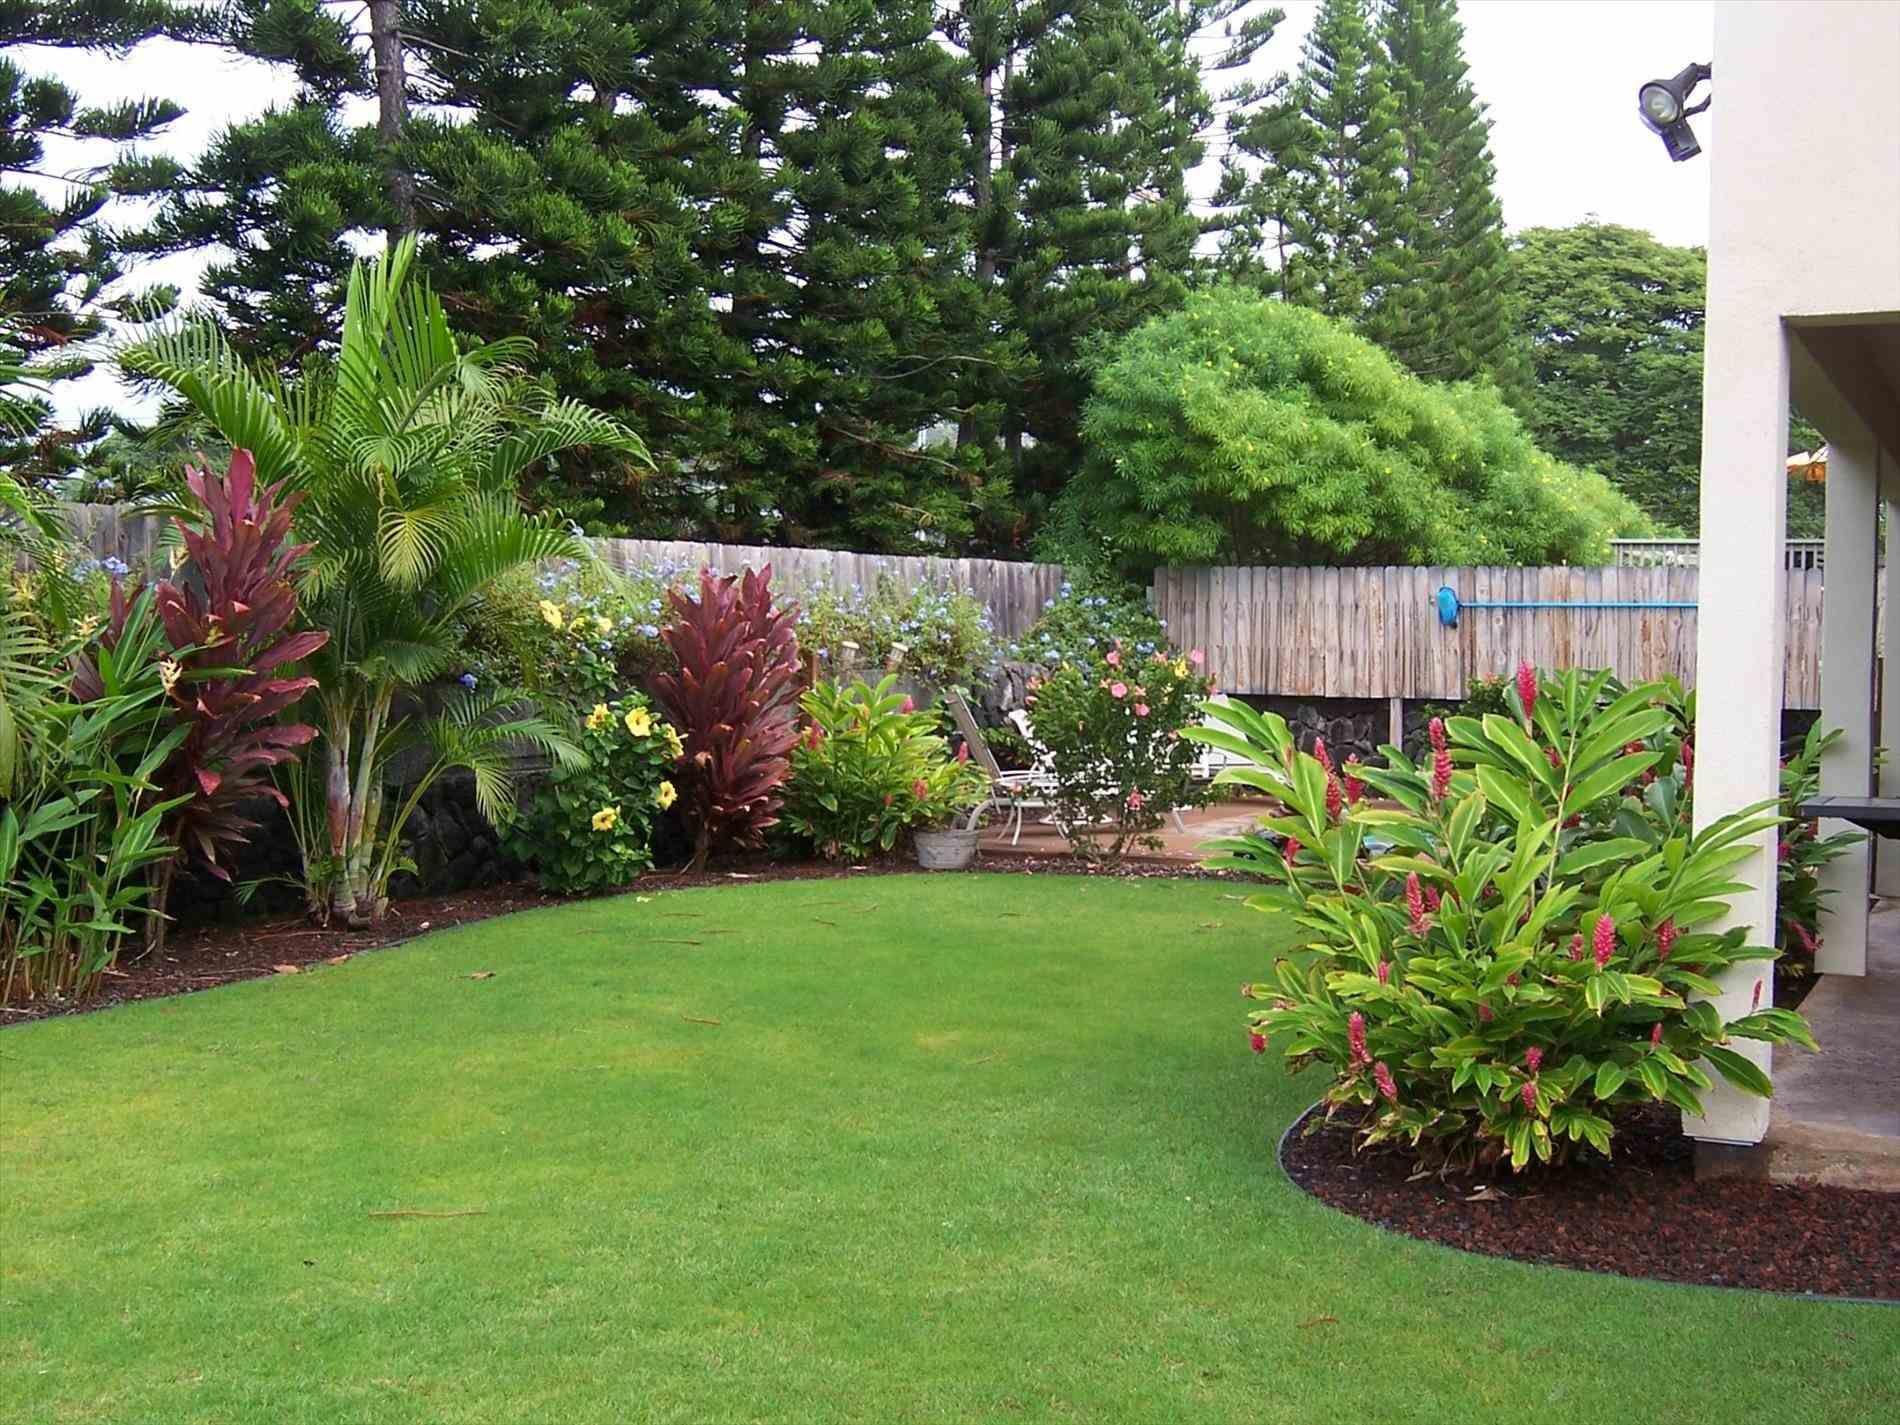 Florida Backyard Landscaping Ideas Luxury Florida Landscaping